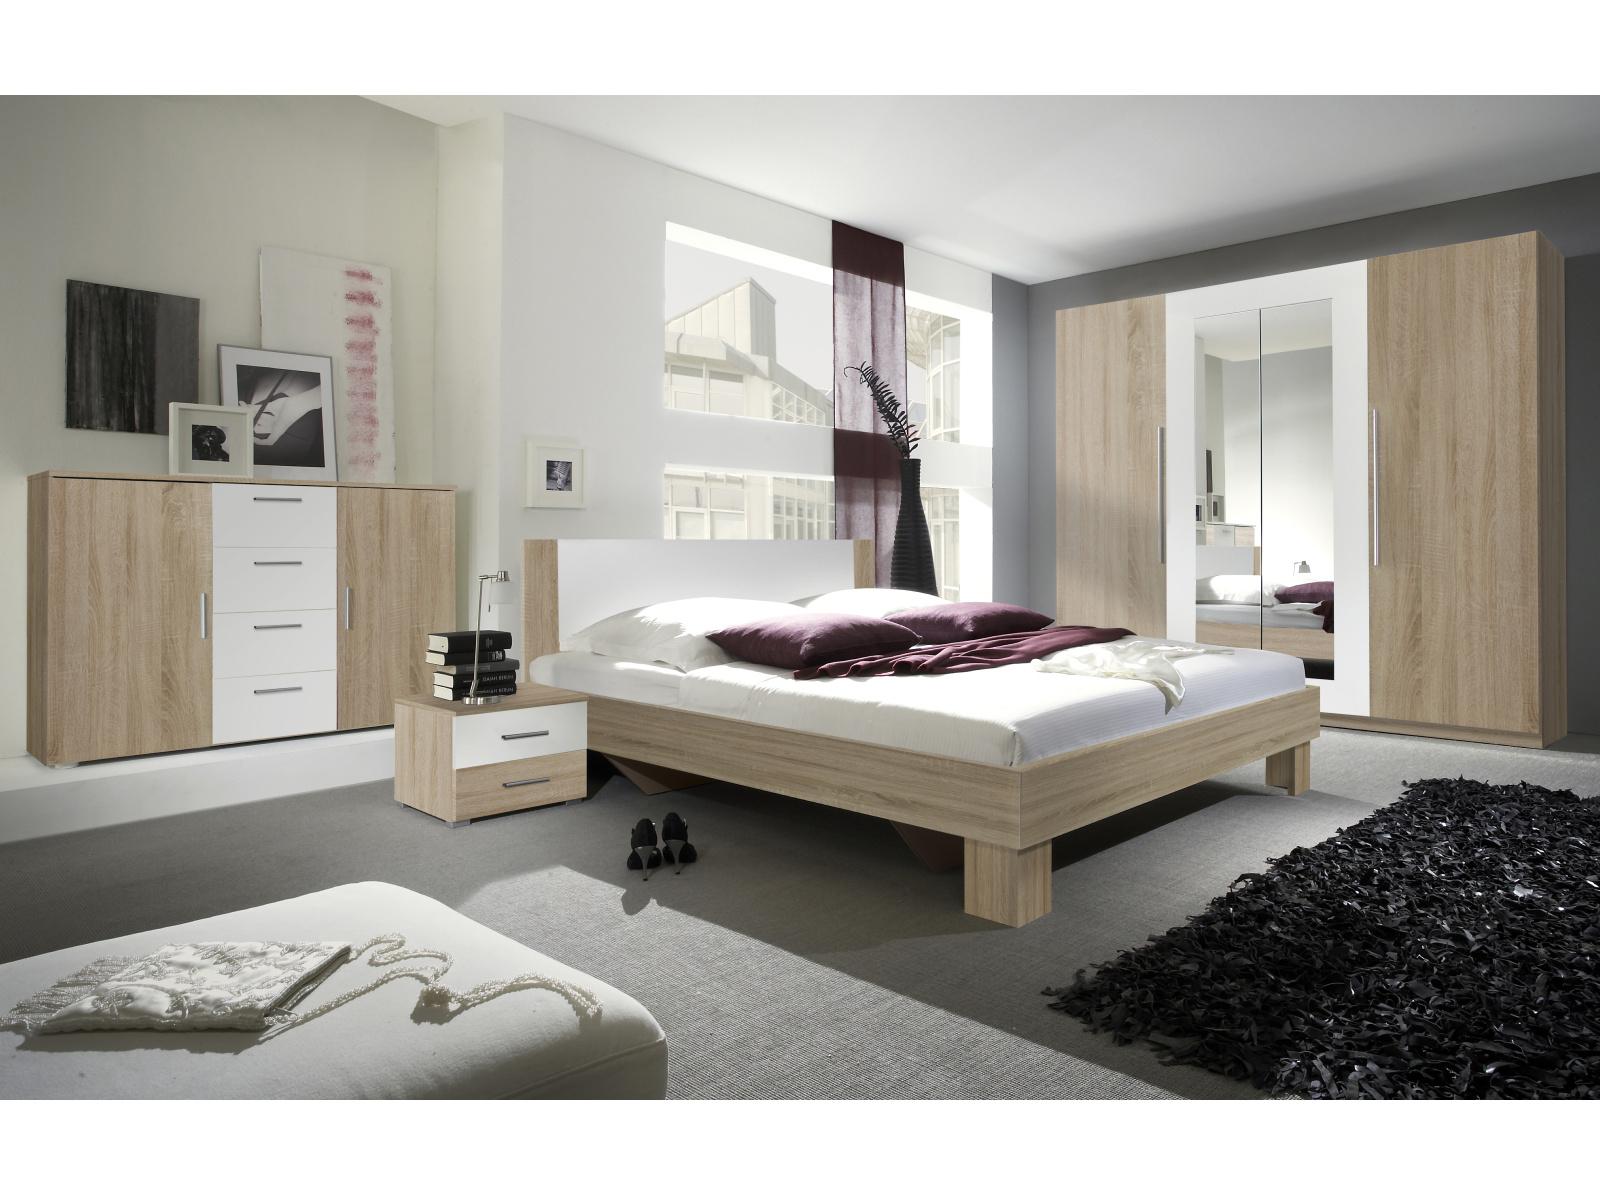 WILDER ložnice s postelí 180x200 cm, dub sonoma/bílá